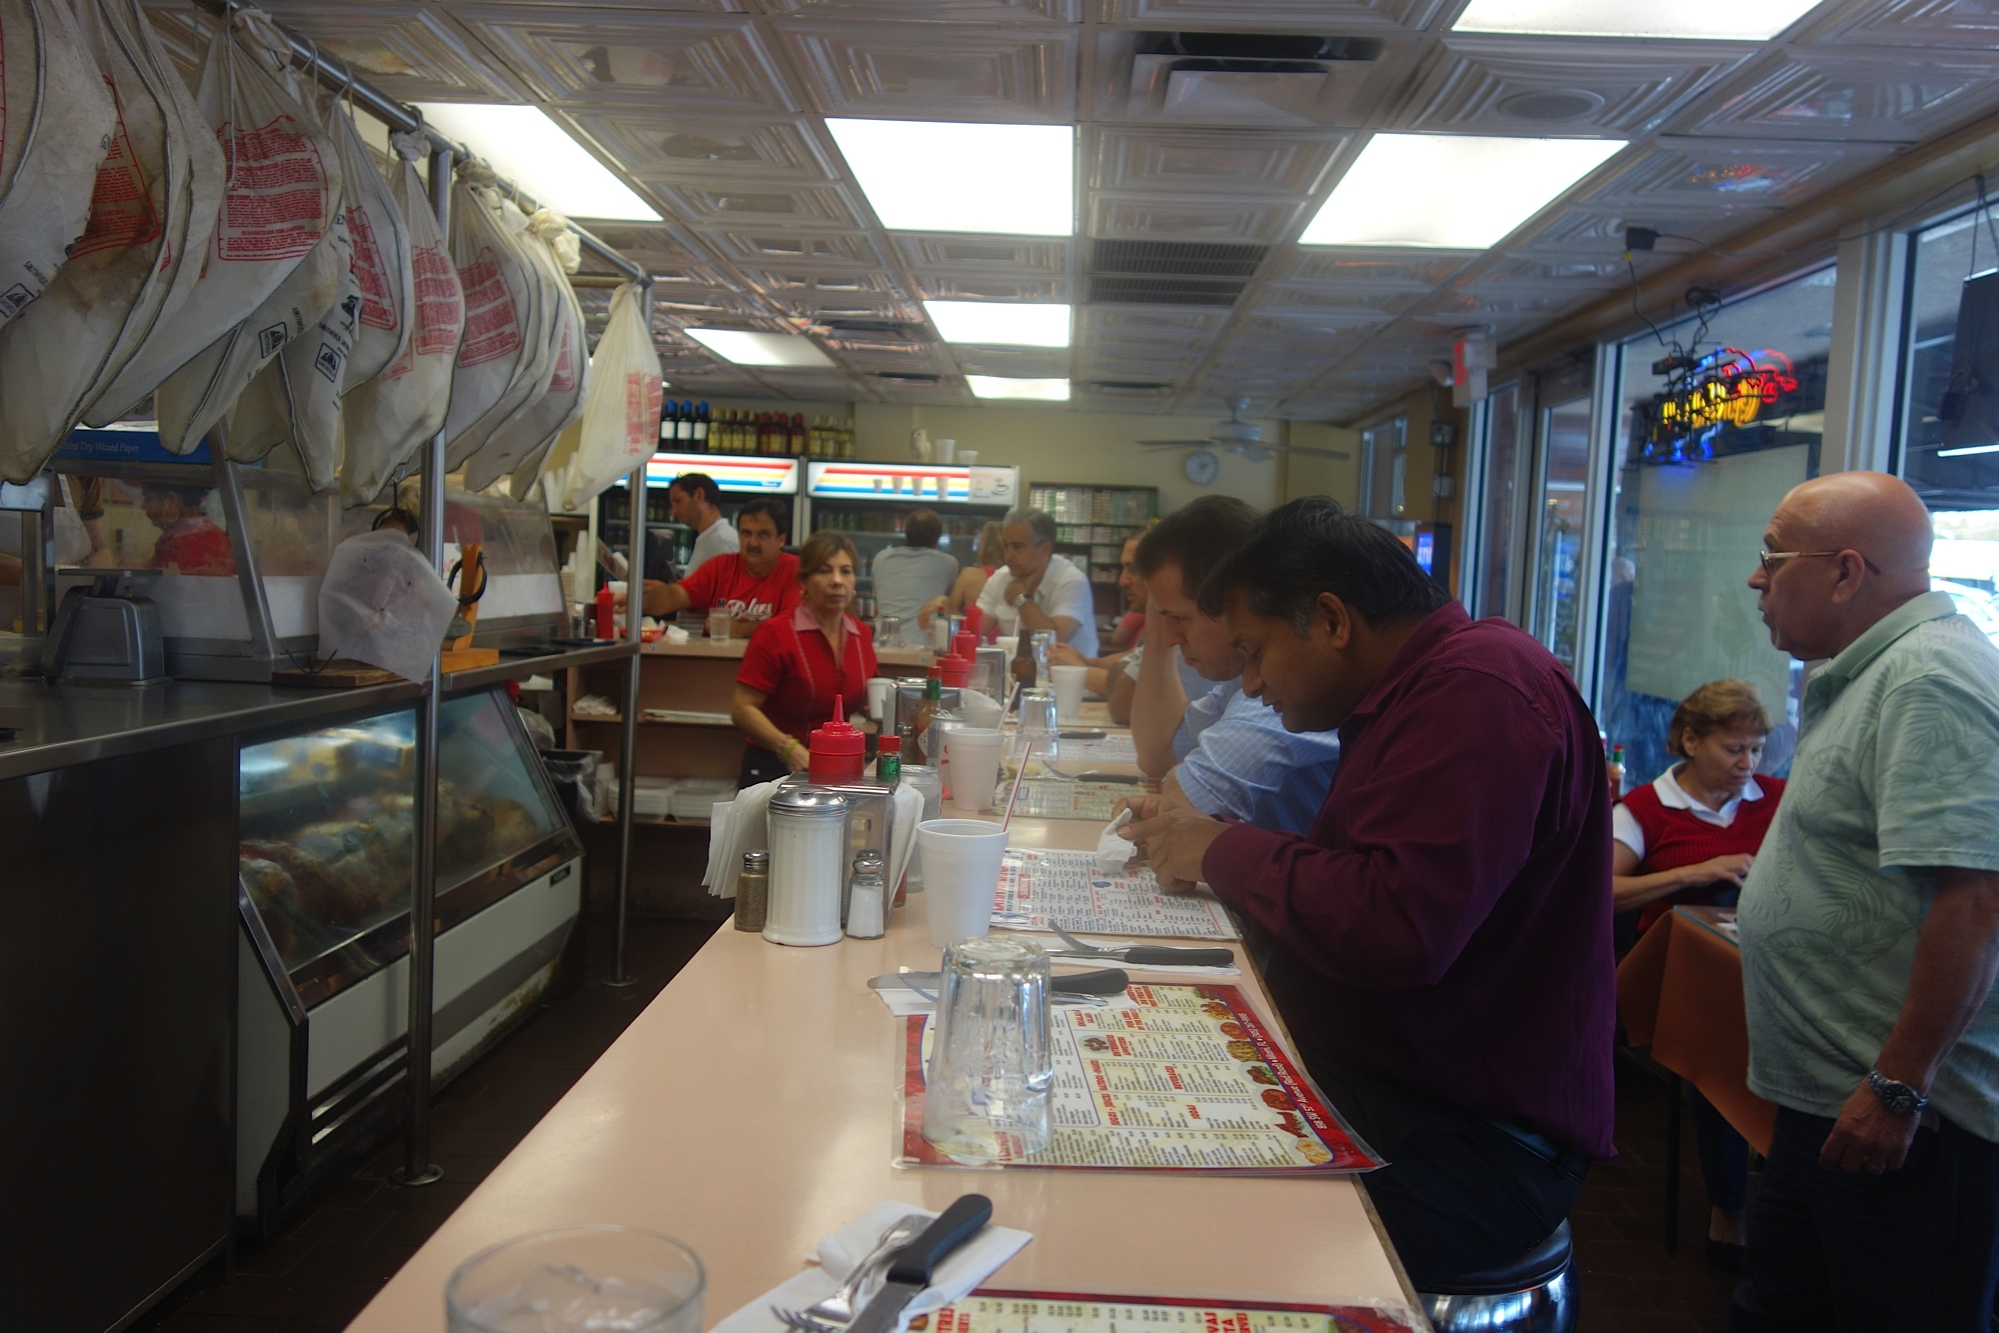 Latin American restaurant counter